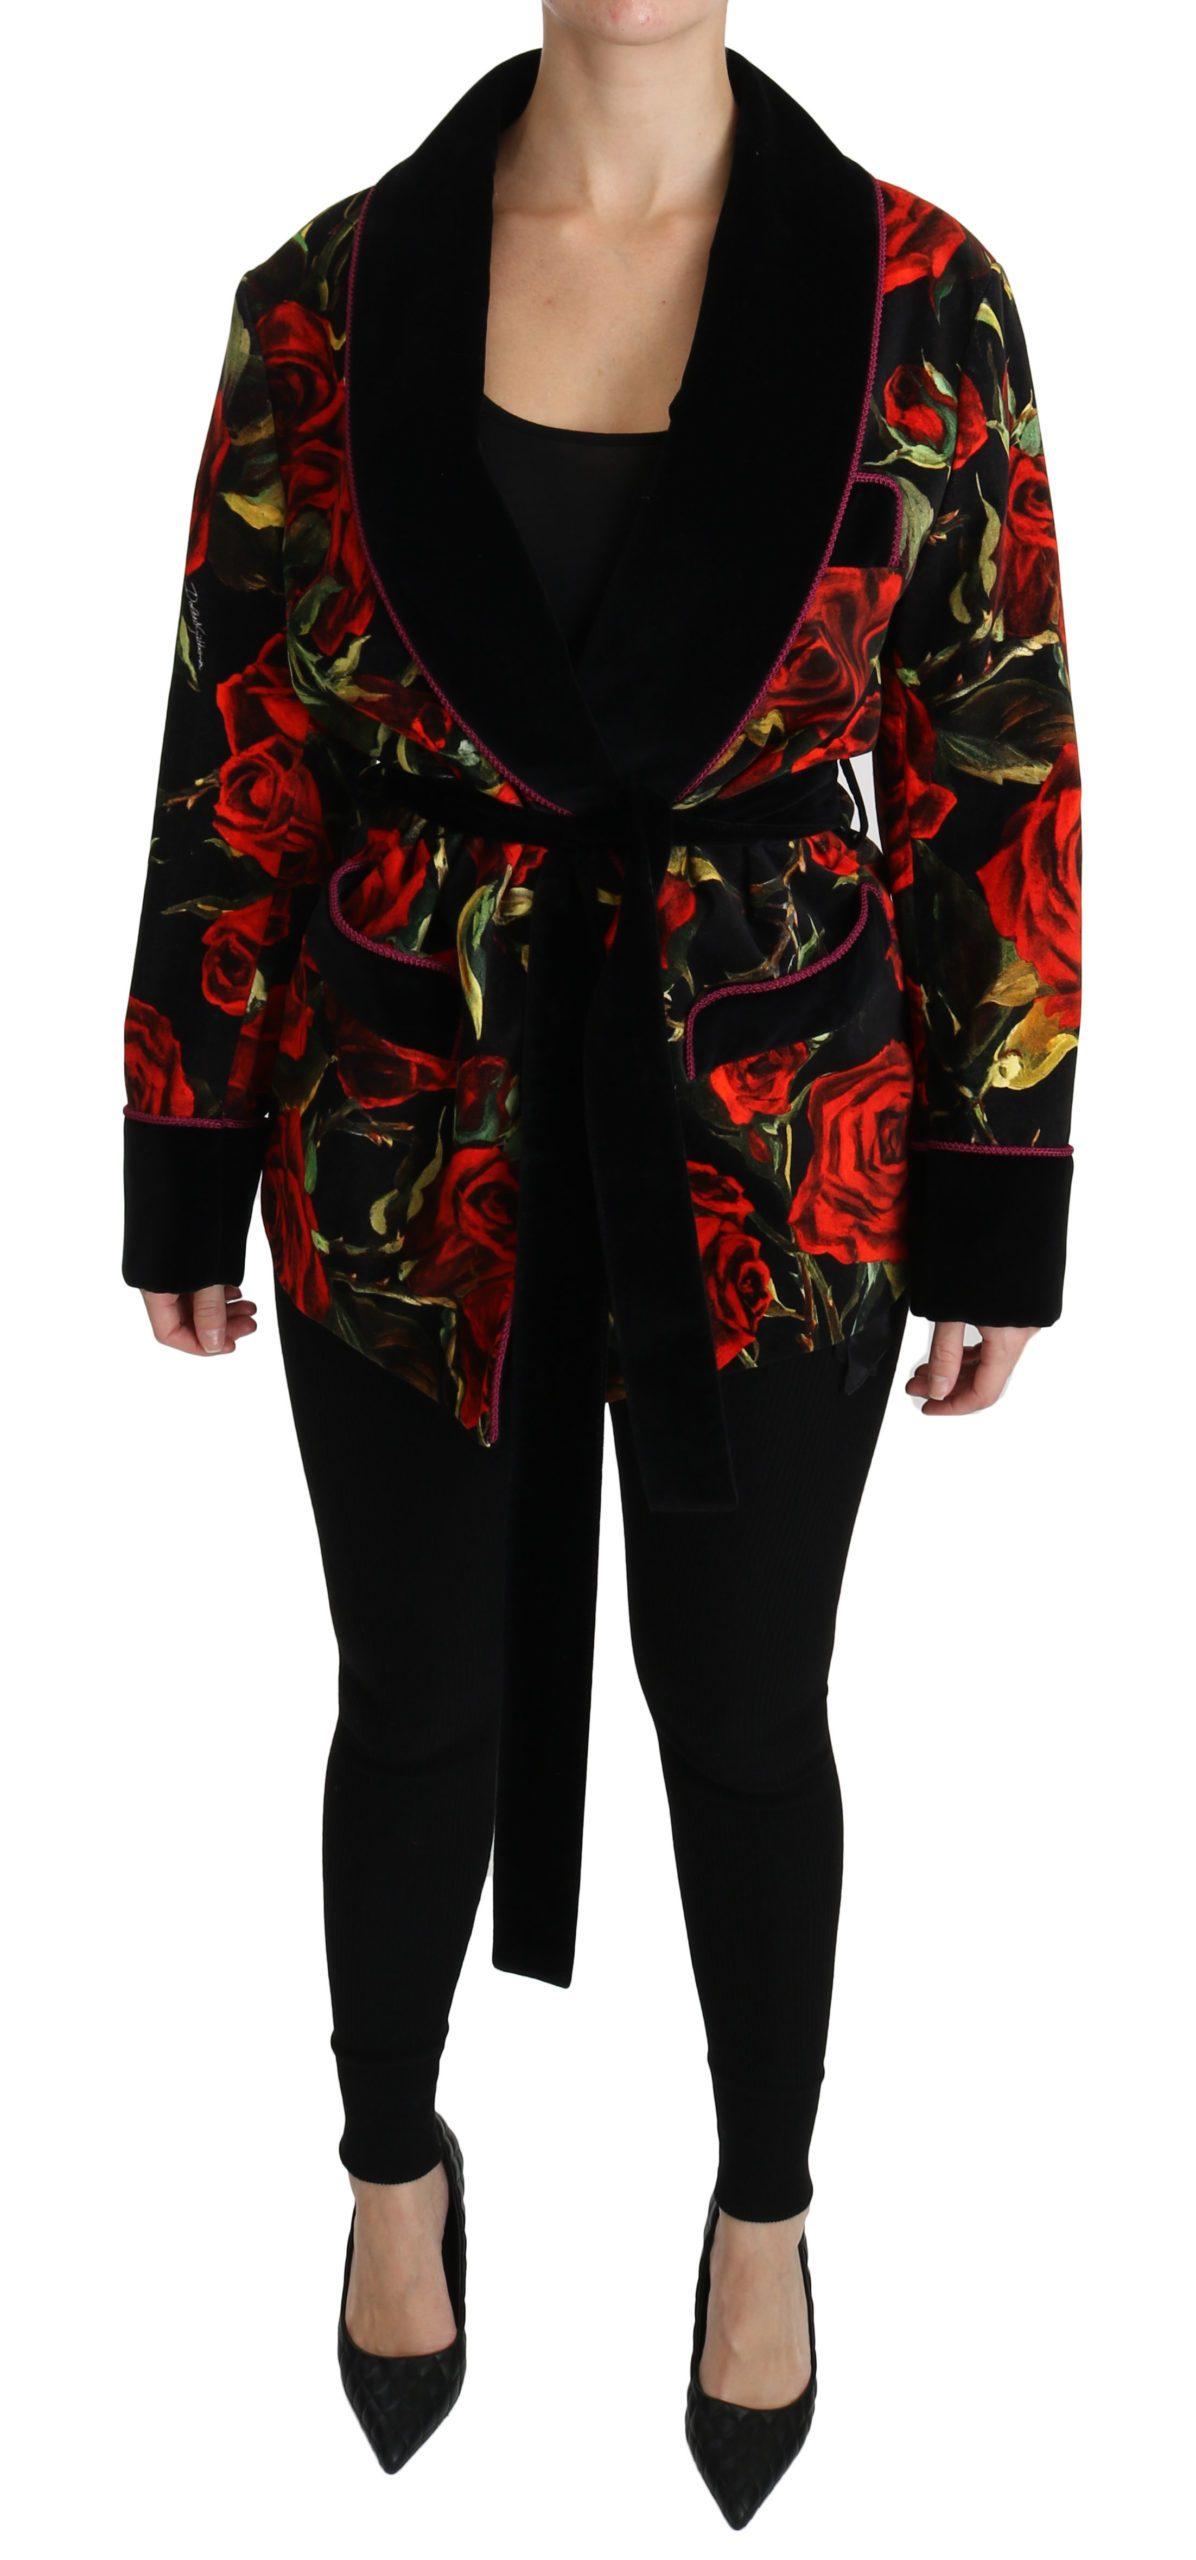 Dolce & Gabbana Women's Floral Robe Cotton Coat Black JKT2497 - IT40|S